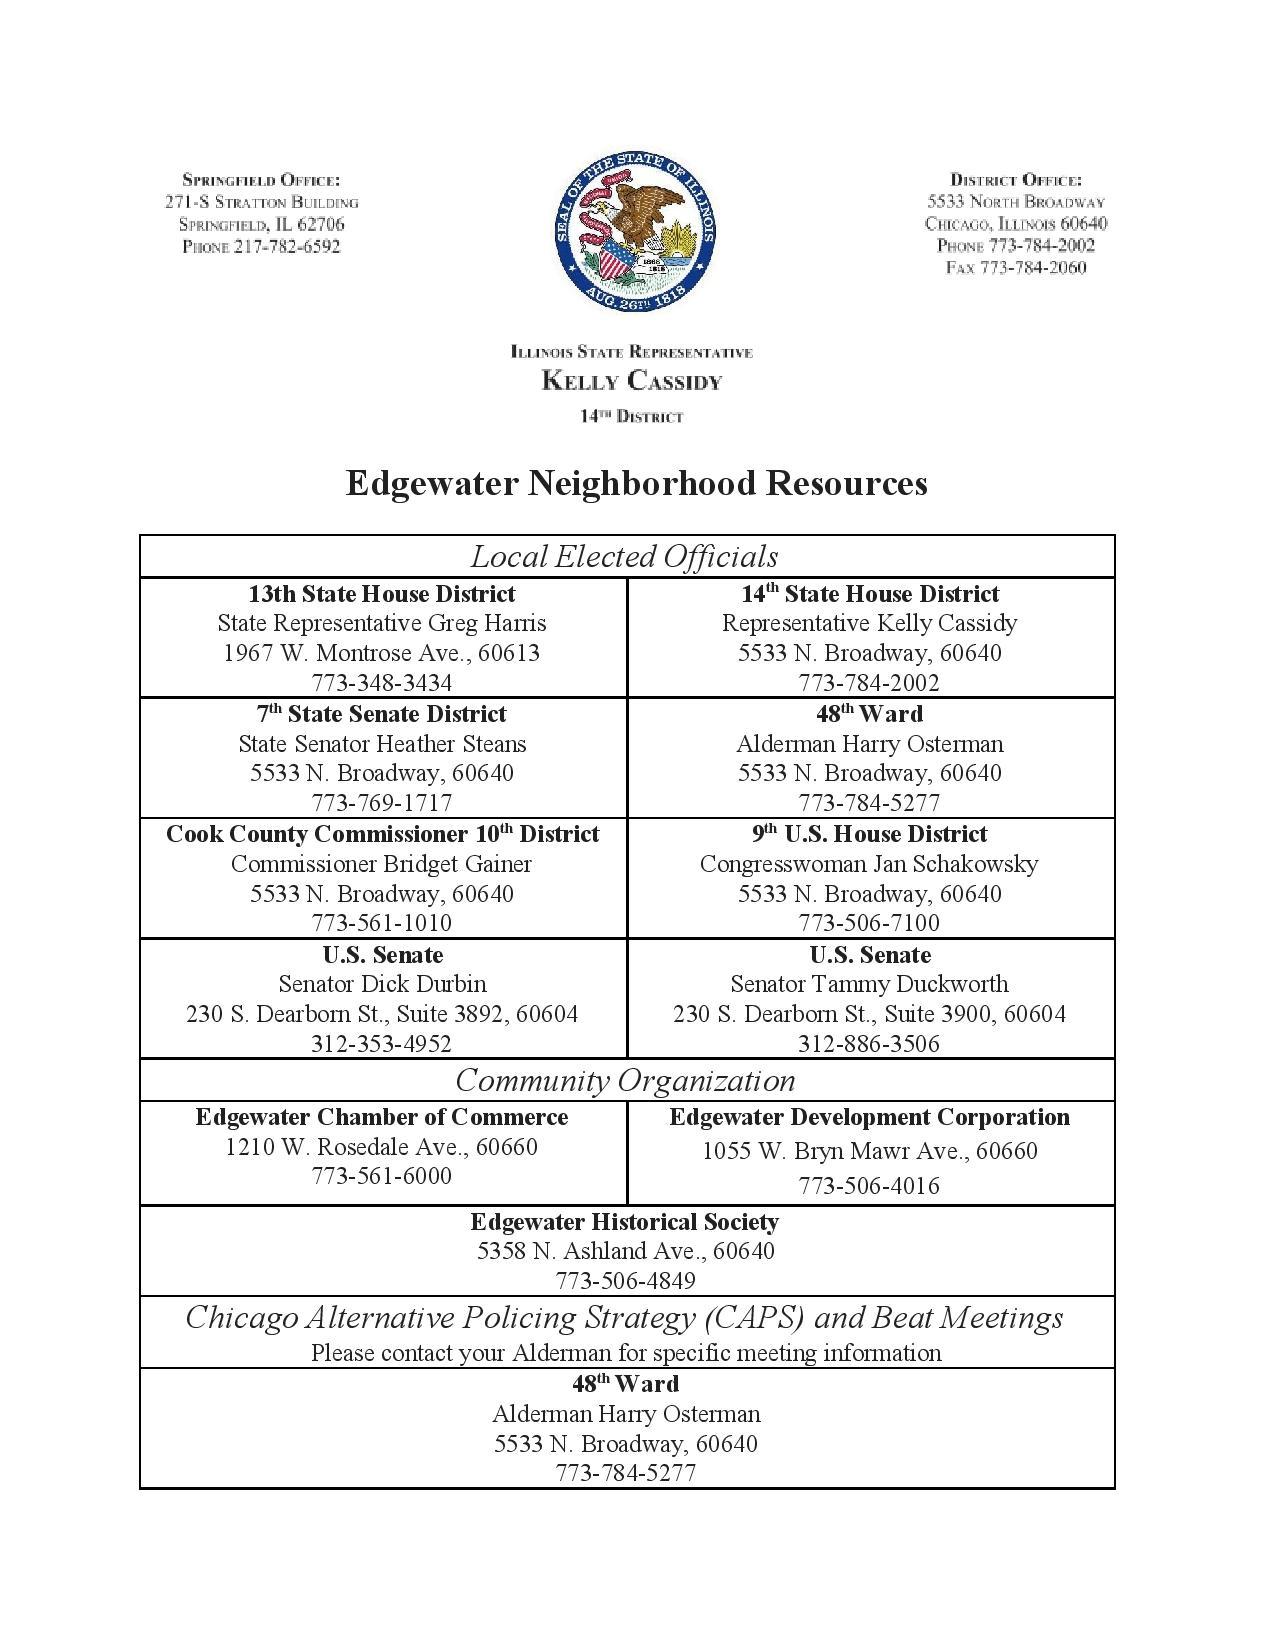 Edgewater Neighborhood Resources-page-001.jpg